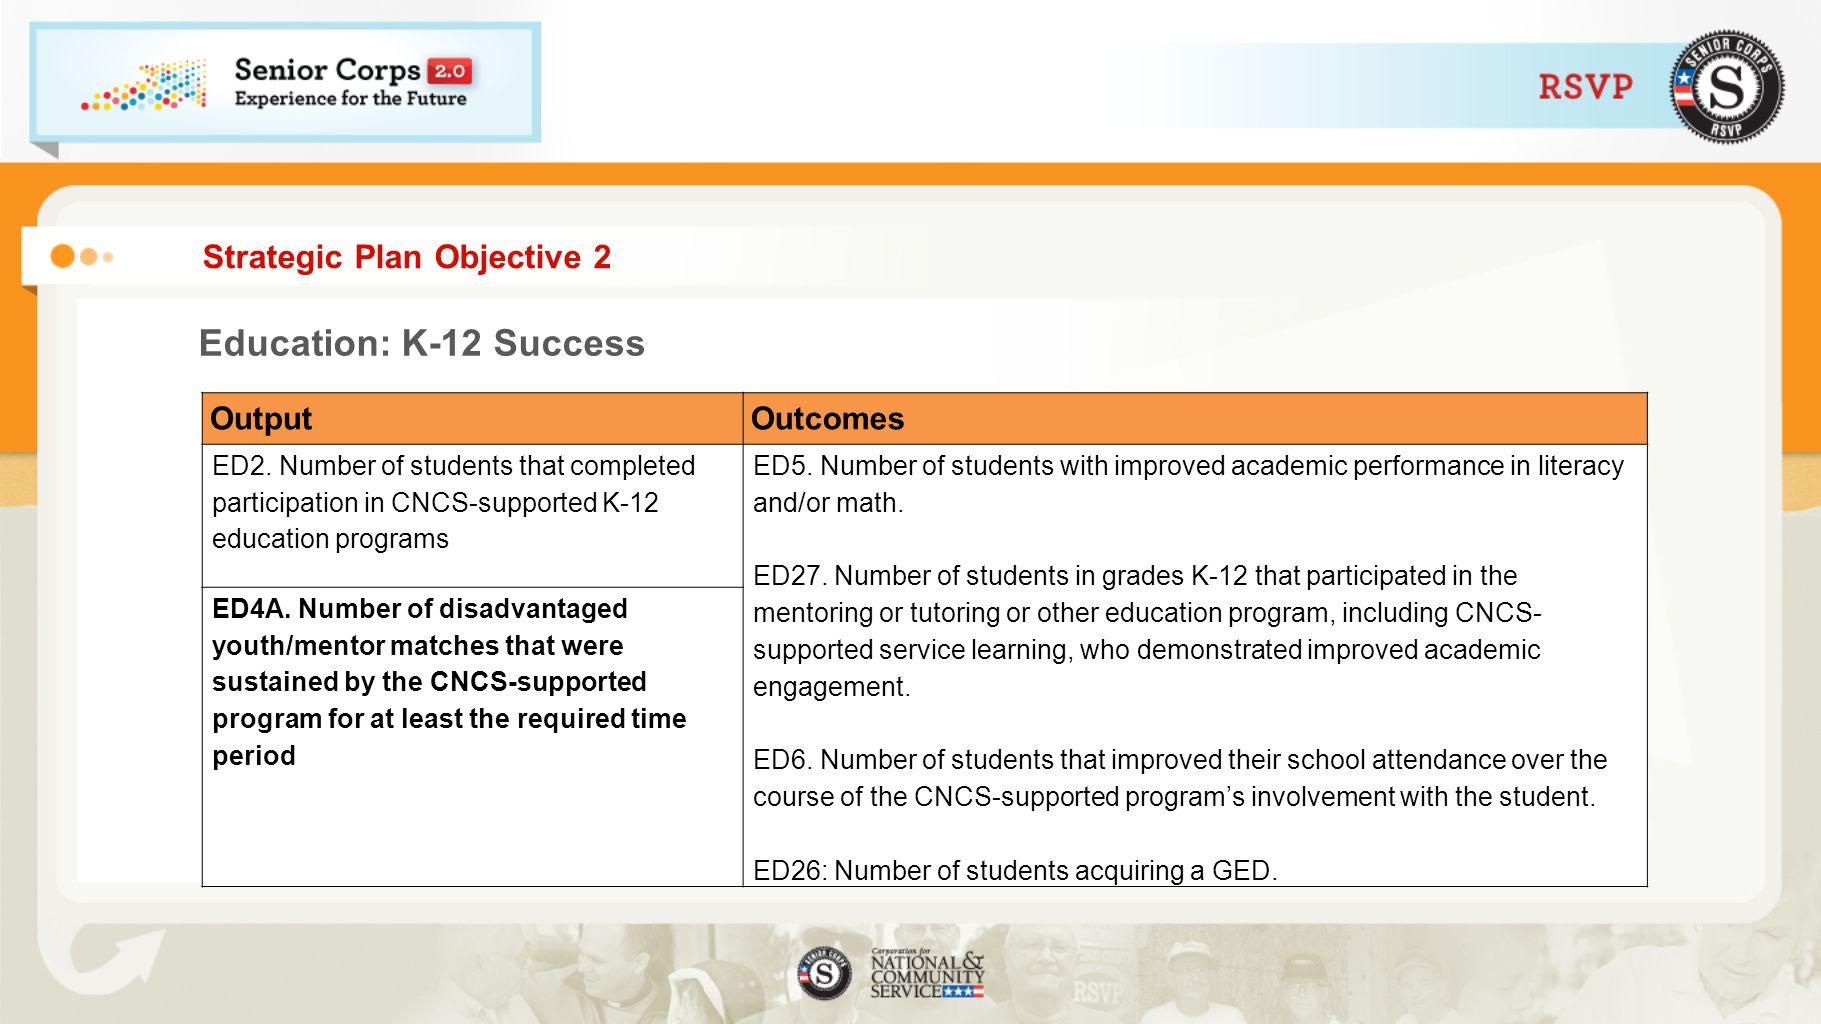 Strategic Plan Objective 2